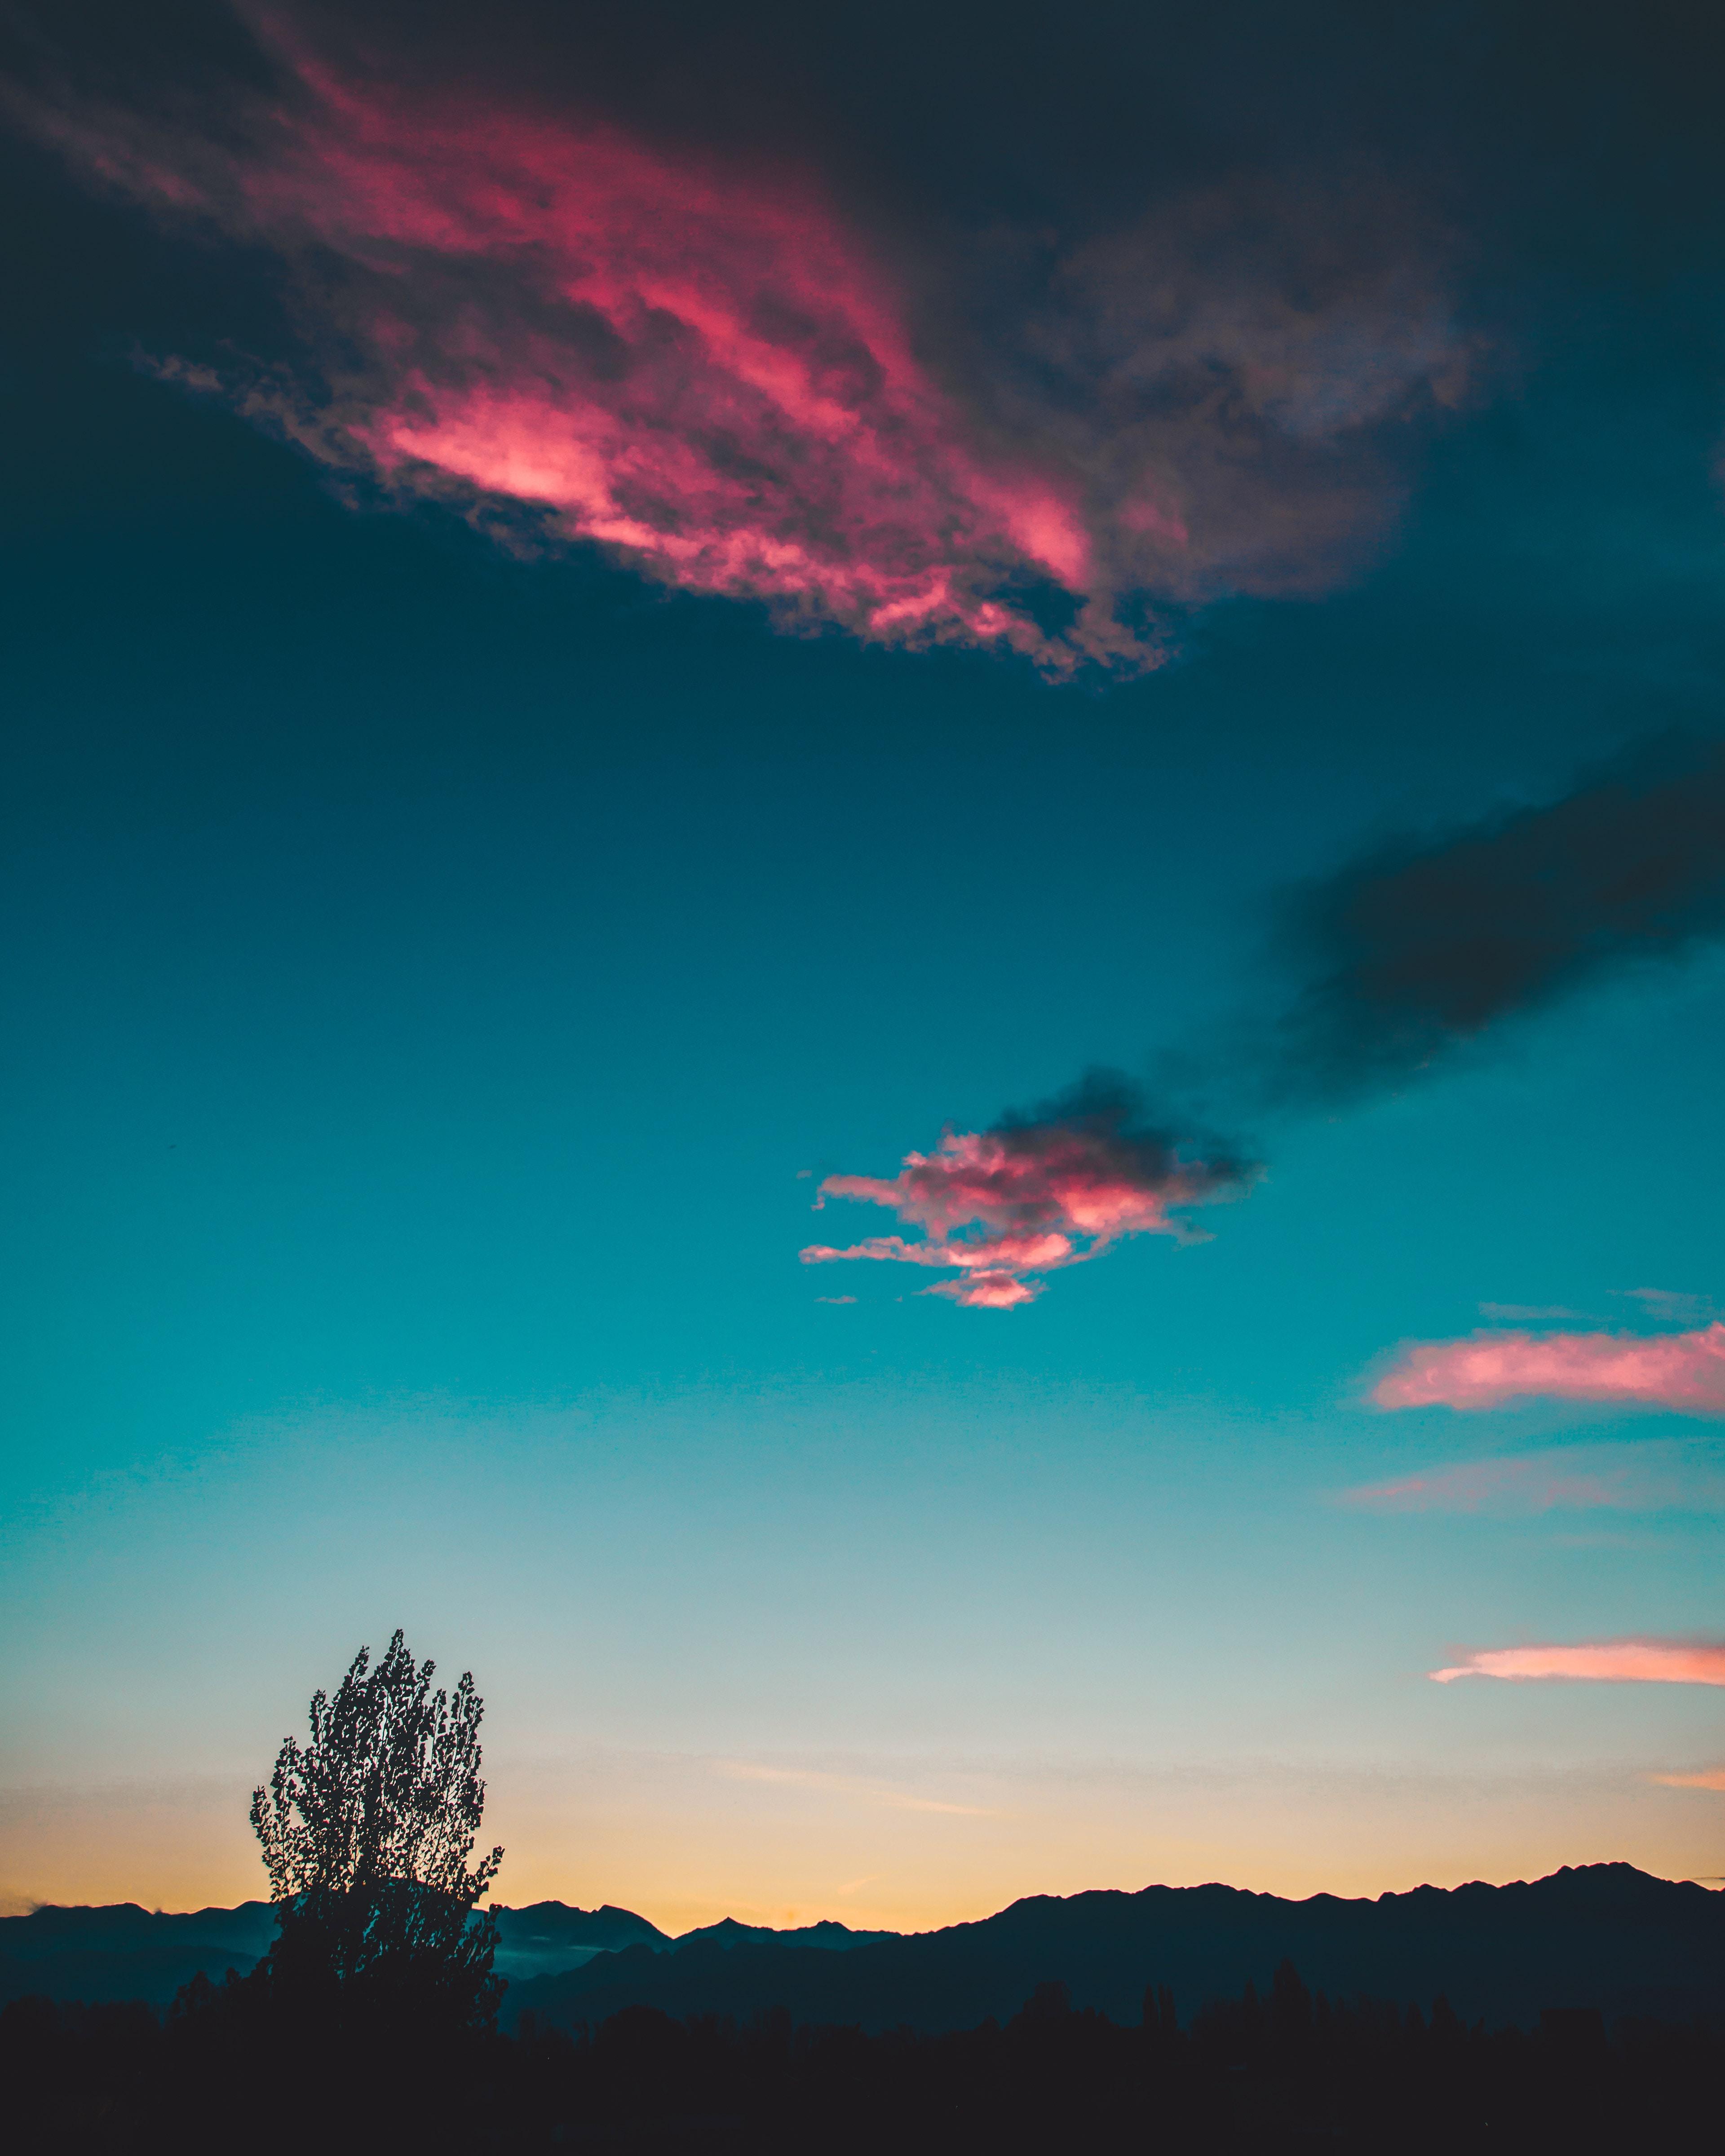 silhouette of tree under sunset